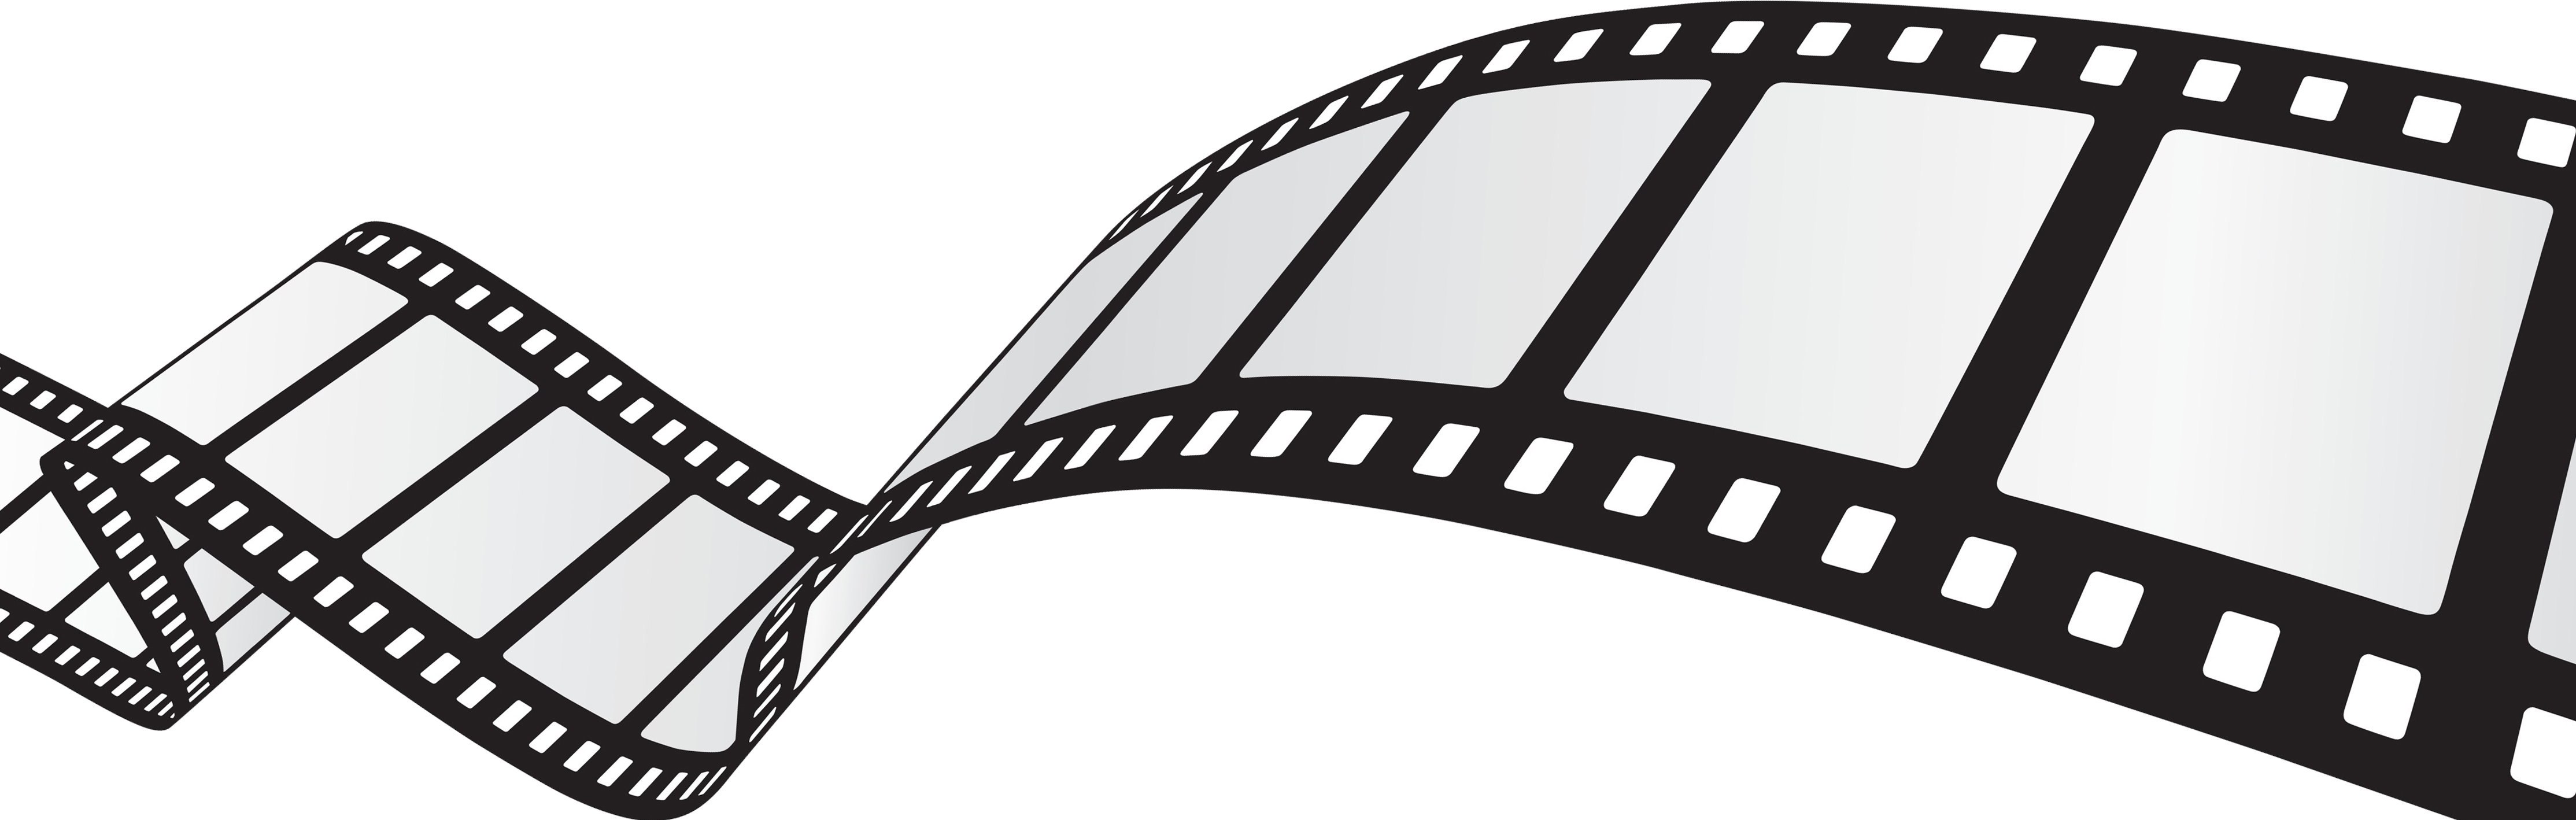 4455x1418 Movie Reel Movie Film Clip Art Clipartfest Strip Clipart 2